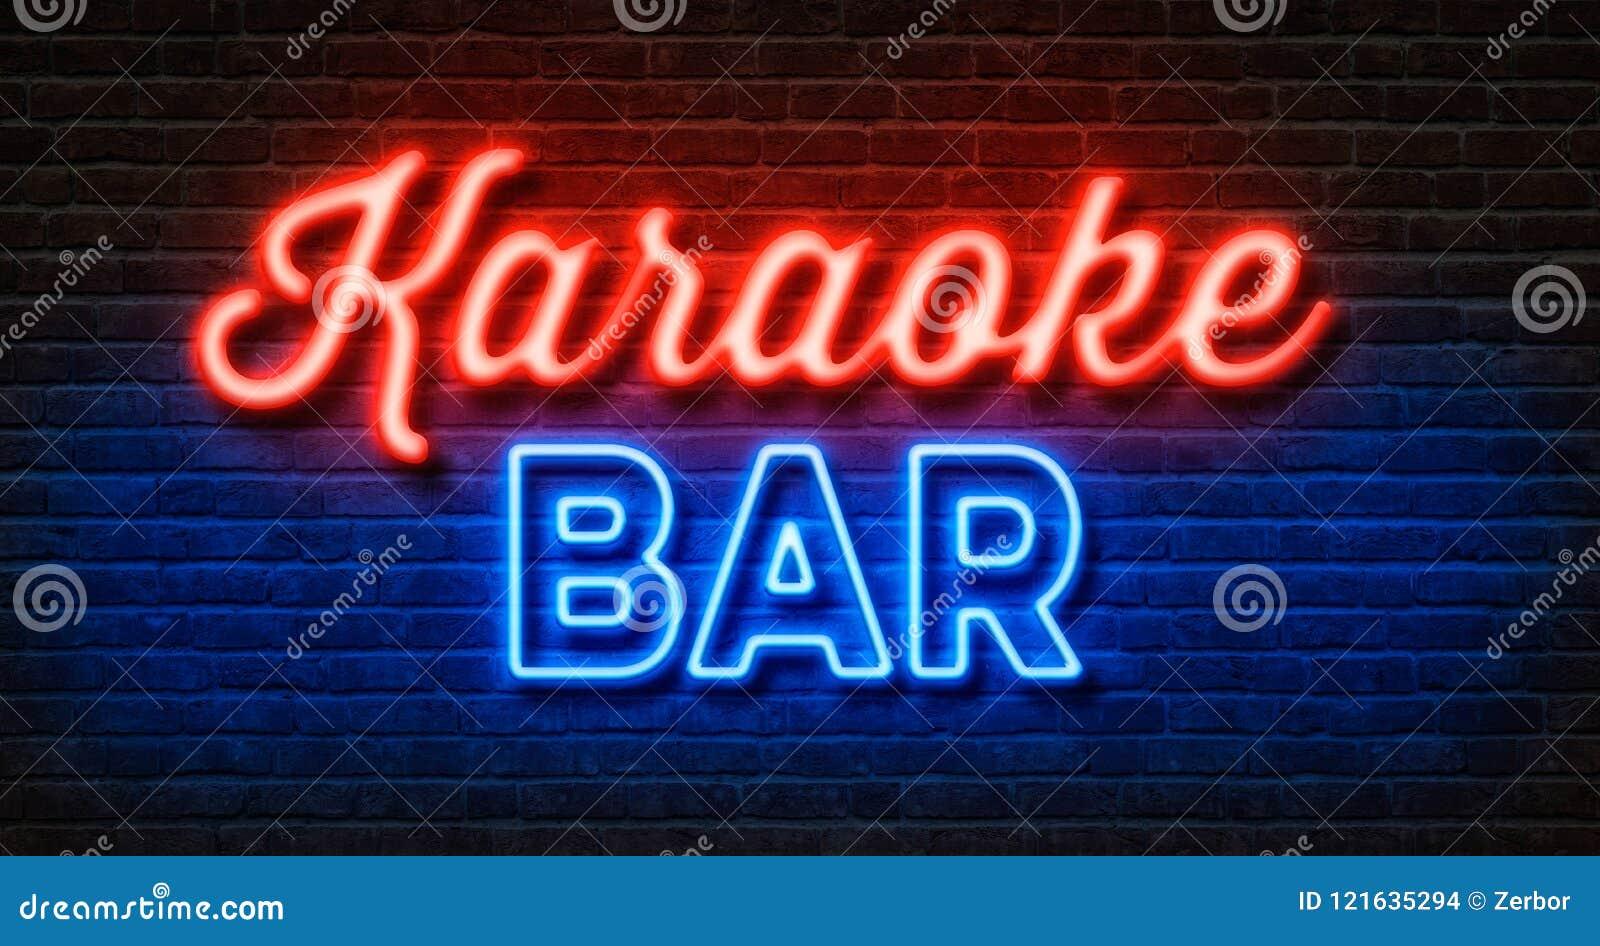 Neon Sign On A Brick Wall - Karaoke Bar Stock Illustration